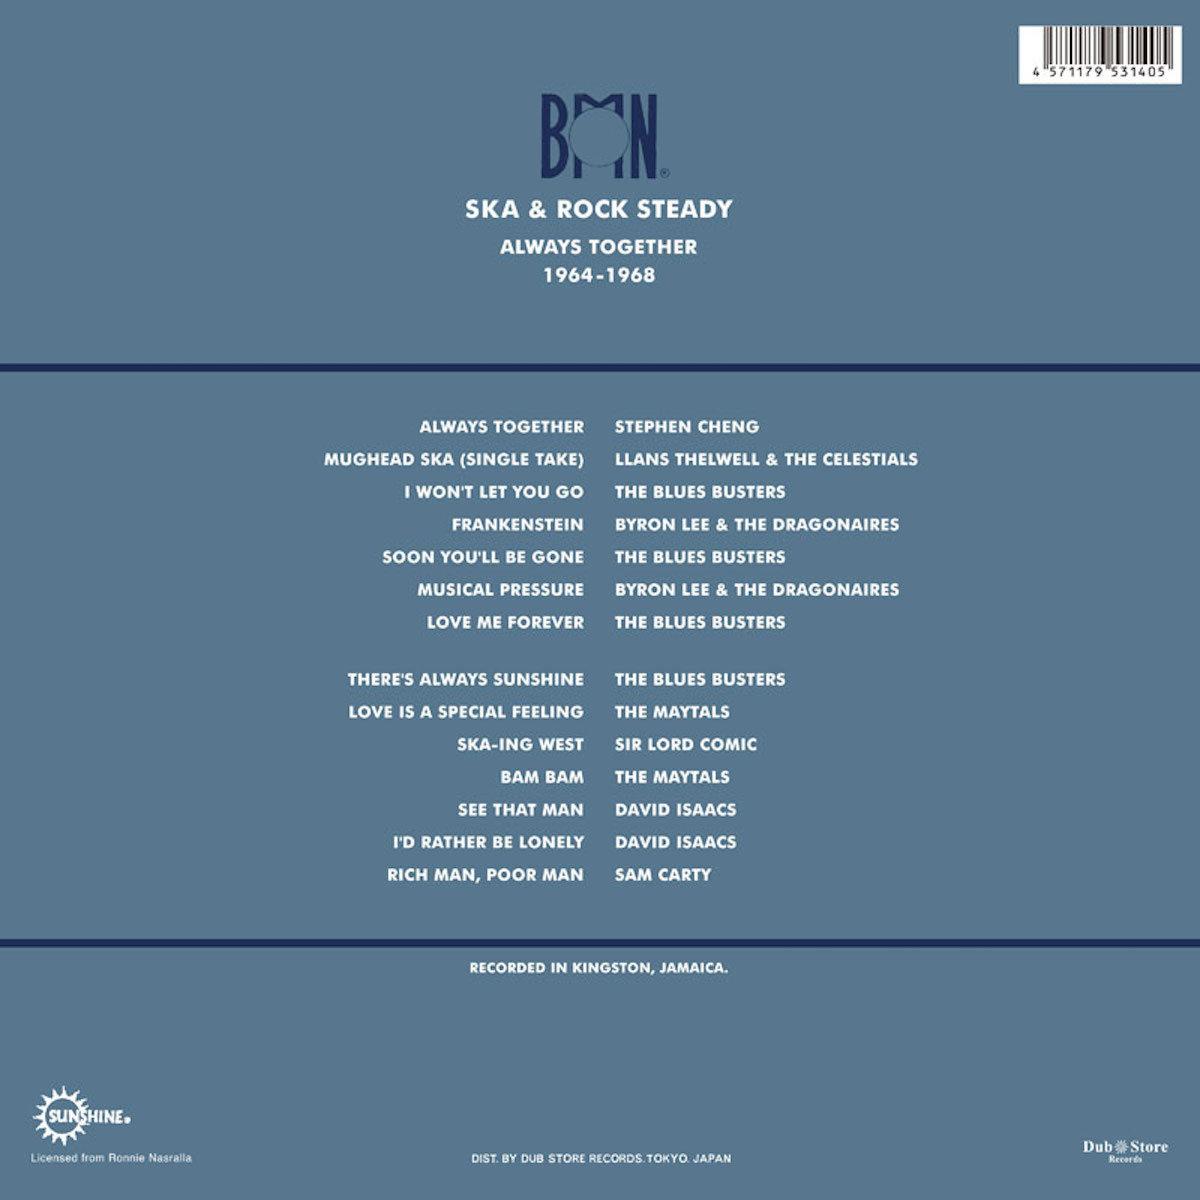 Derrick harriott rock steady party | dub store records.